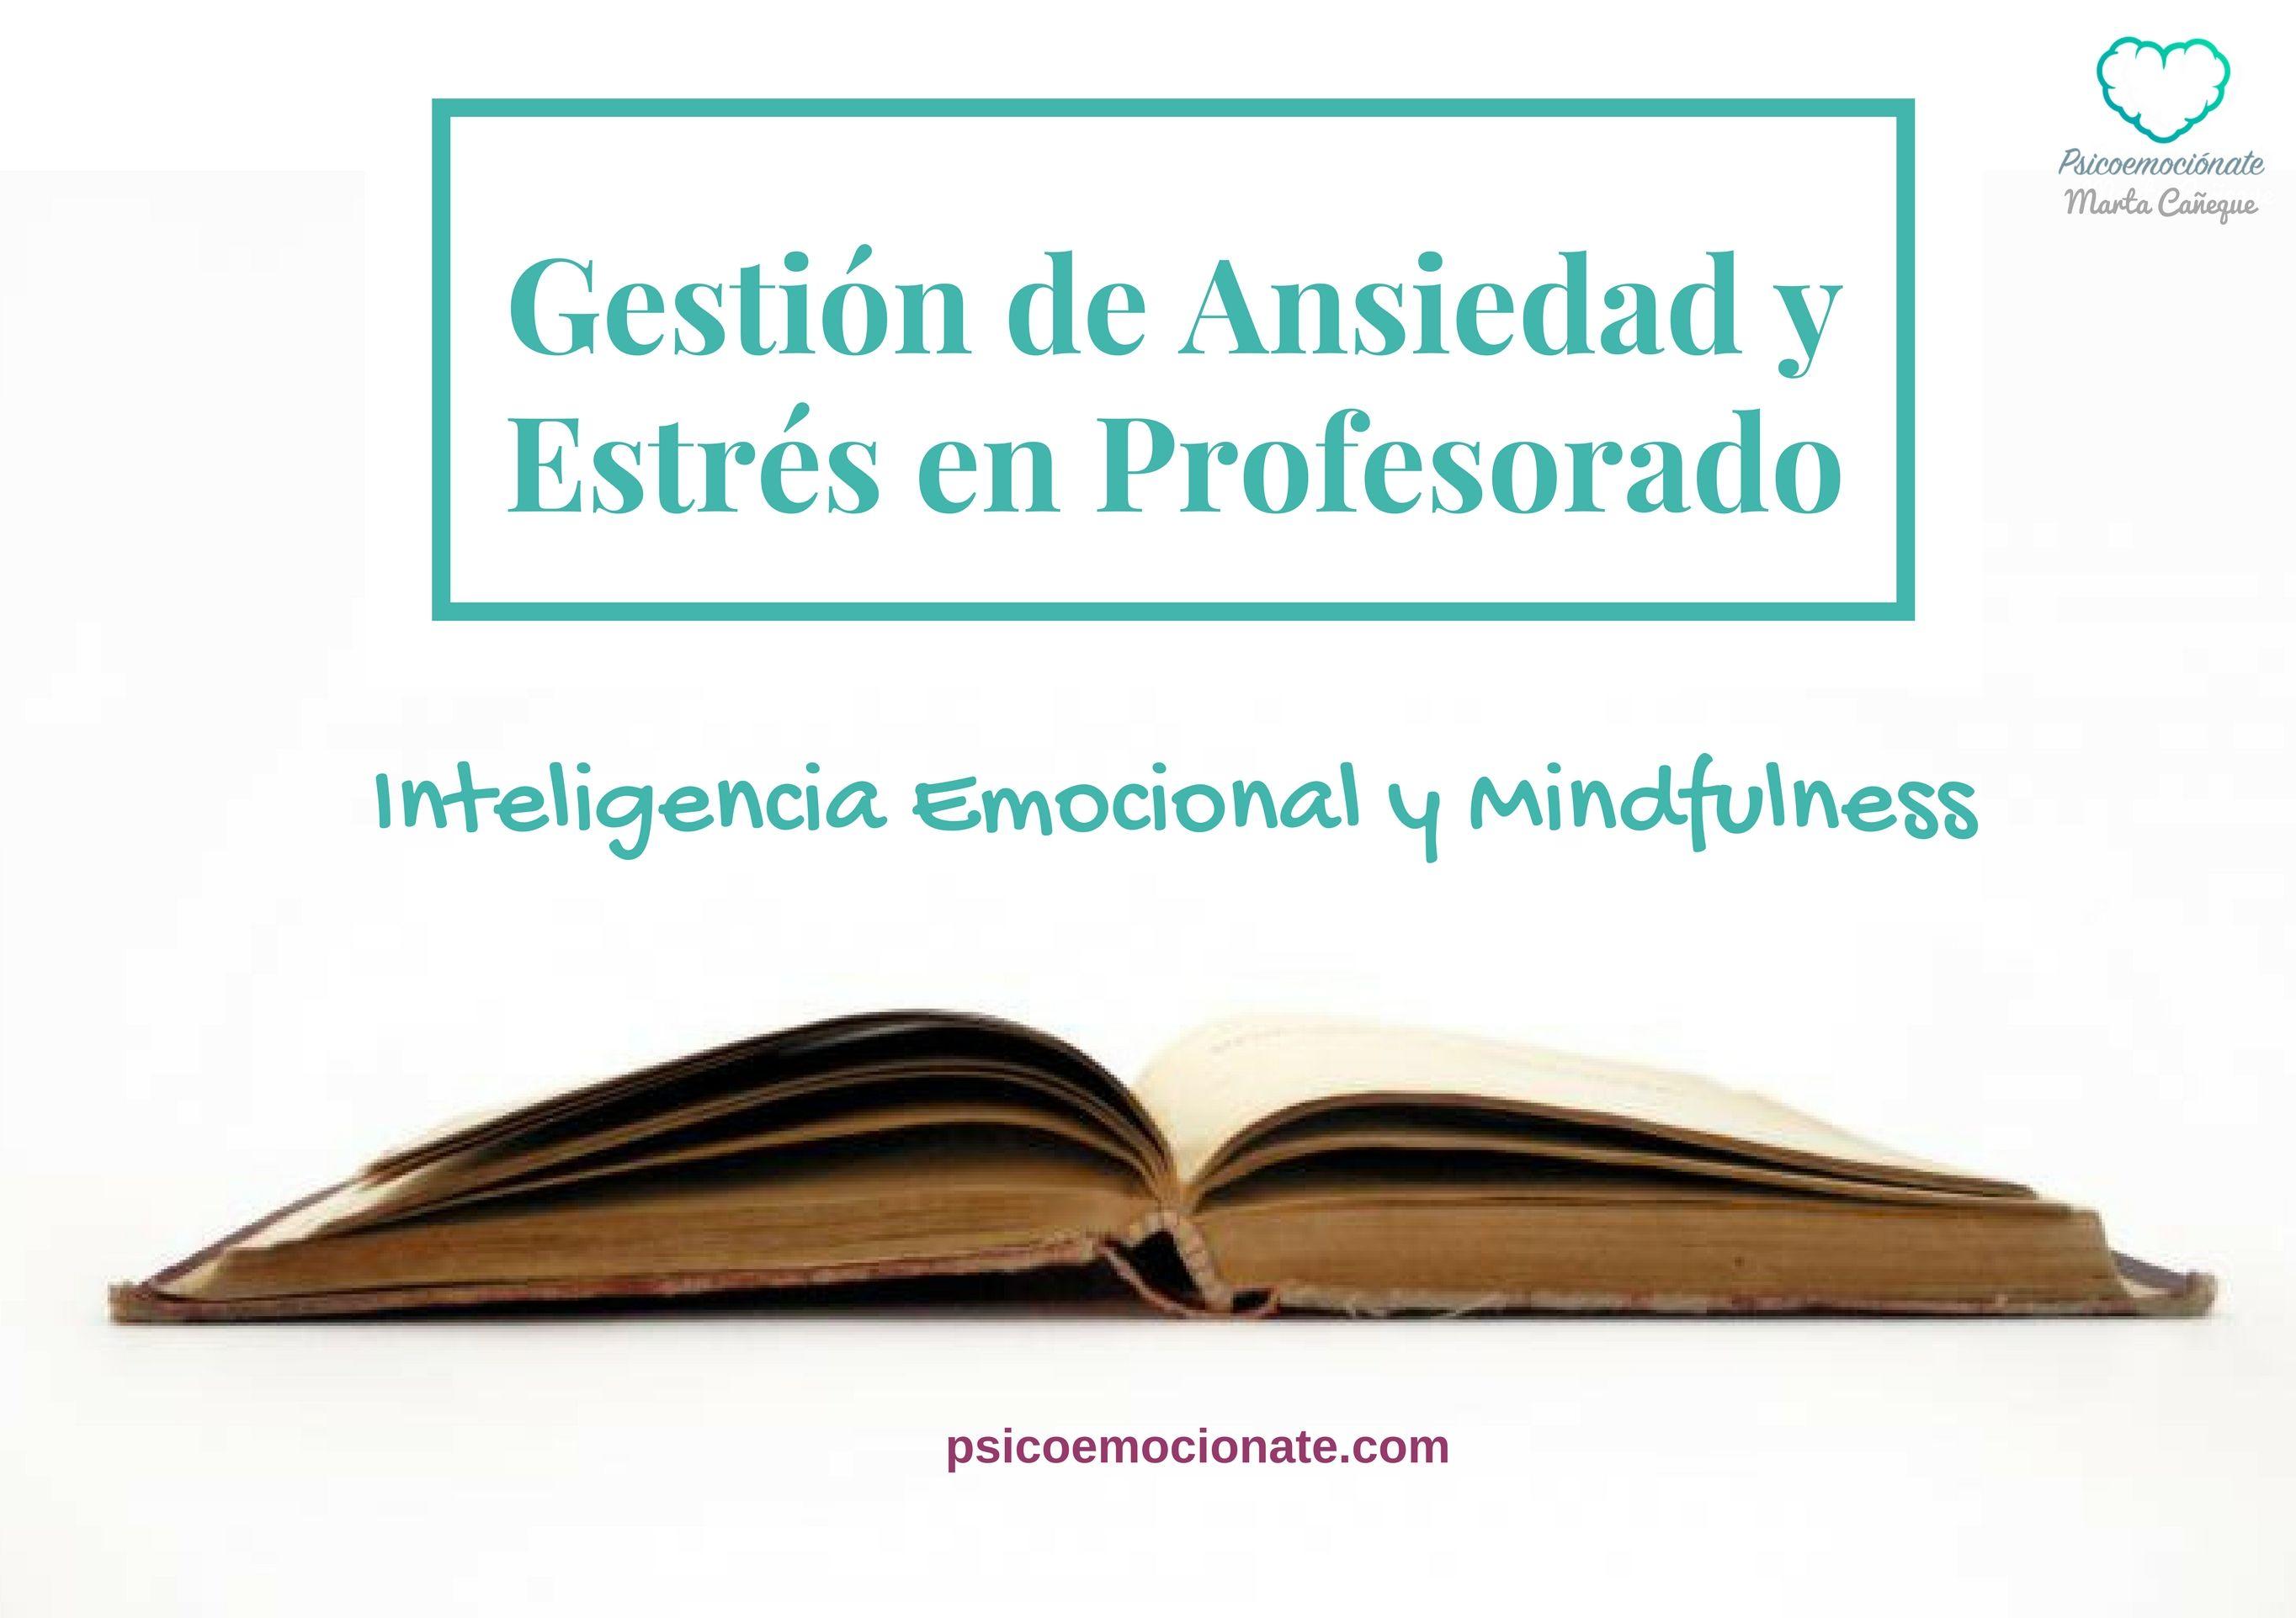 Profesorado Mindfulness Inteligencia Emocional Psicoemocionate